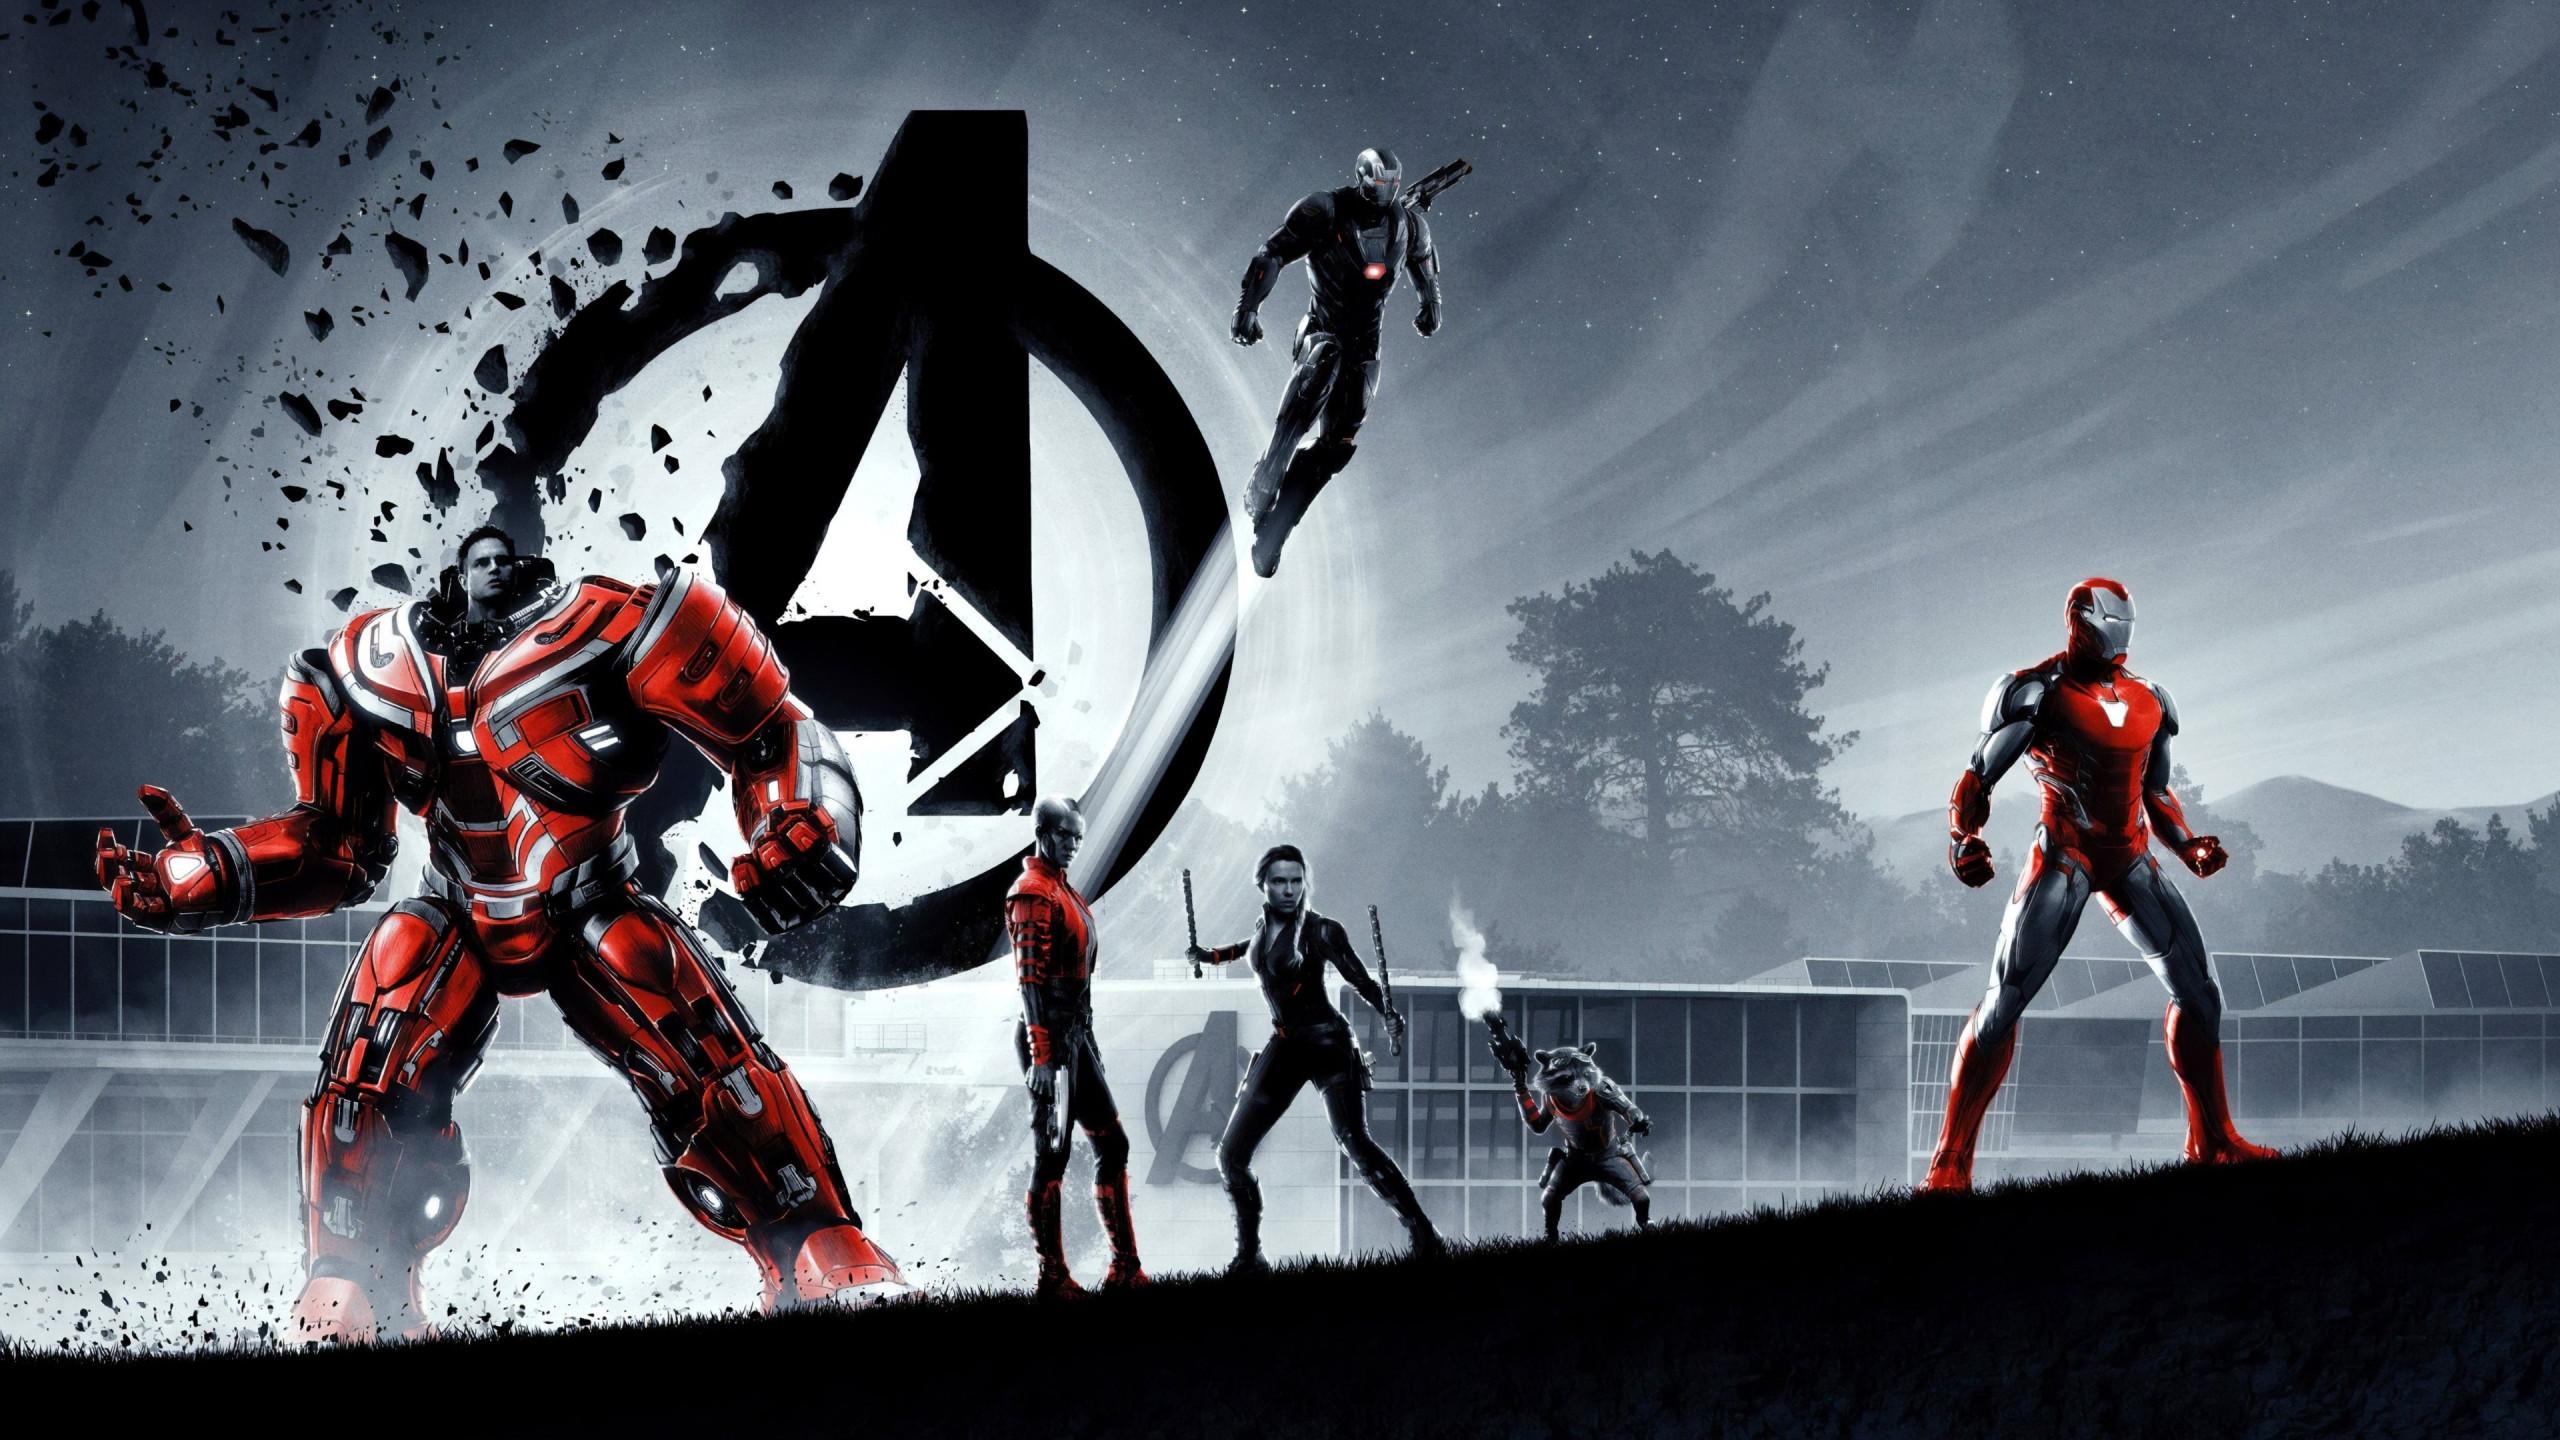 Download Wallpaper Avengers Endgame Superheroes 2560x1440